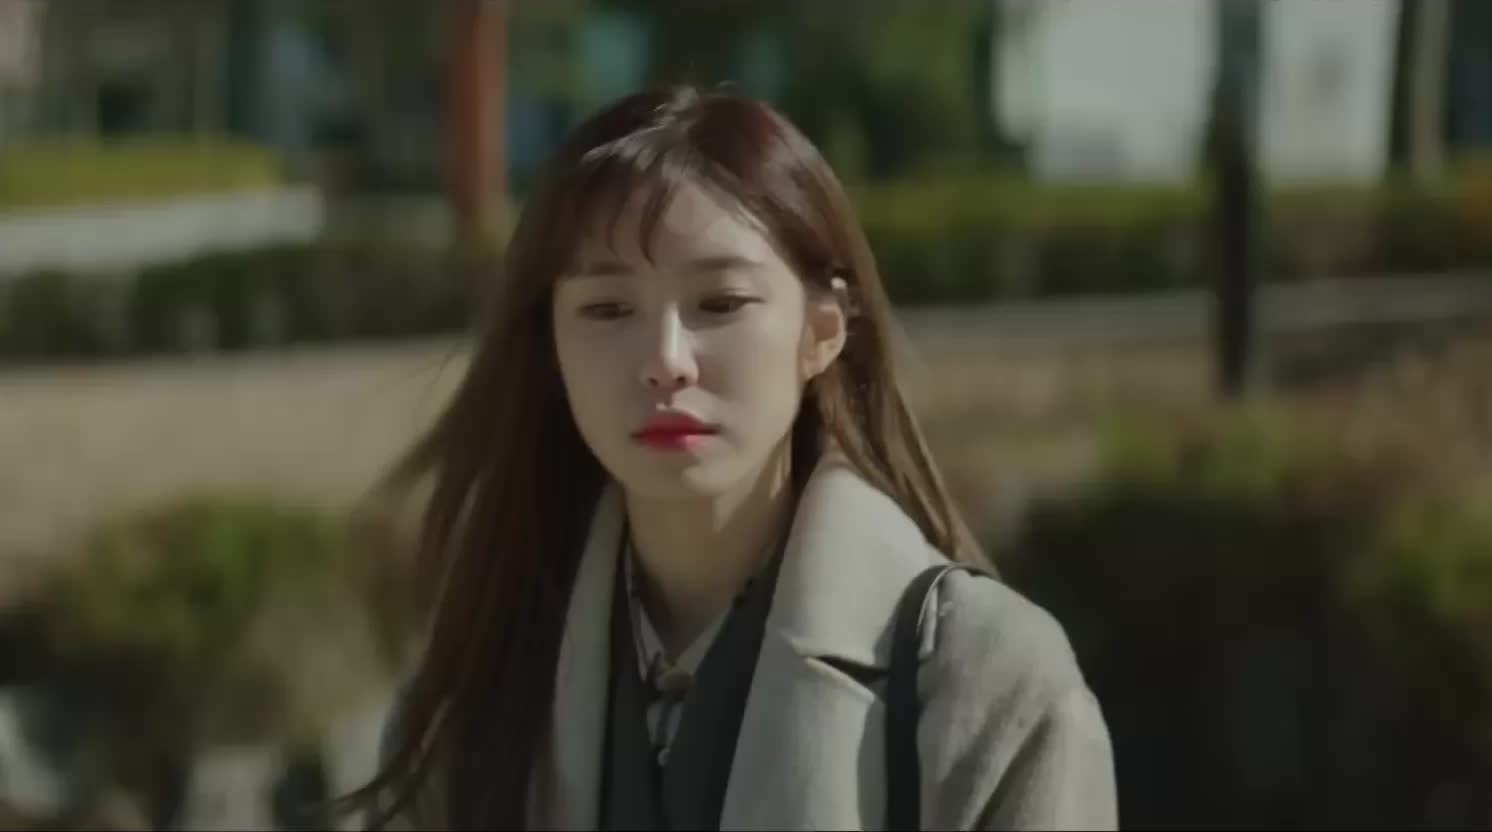 Memorist.S01E10.200409.1080p-NEXT GIF by Hyosung | Gfycat